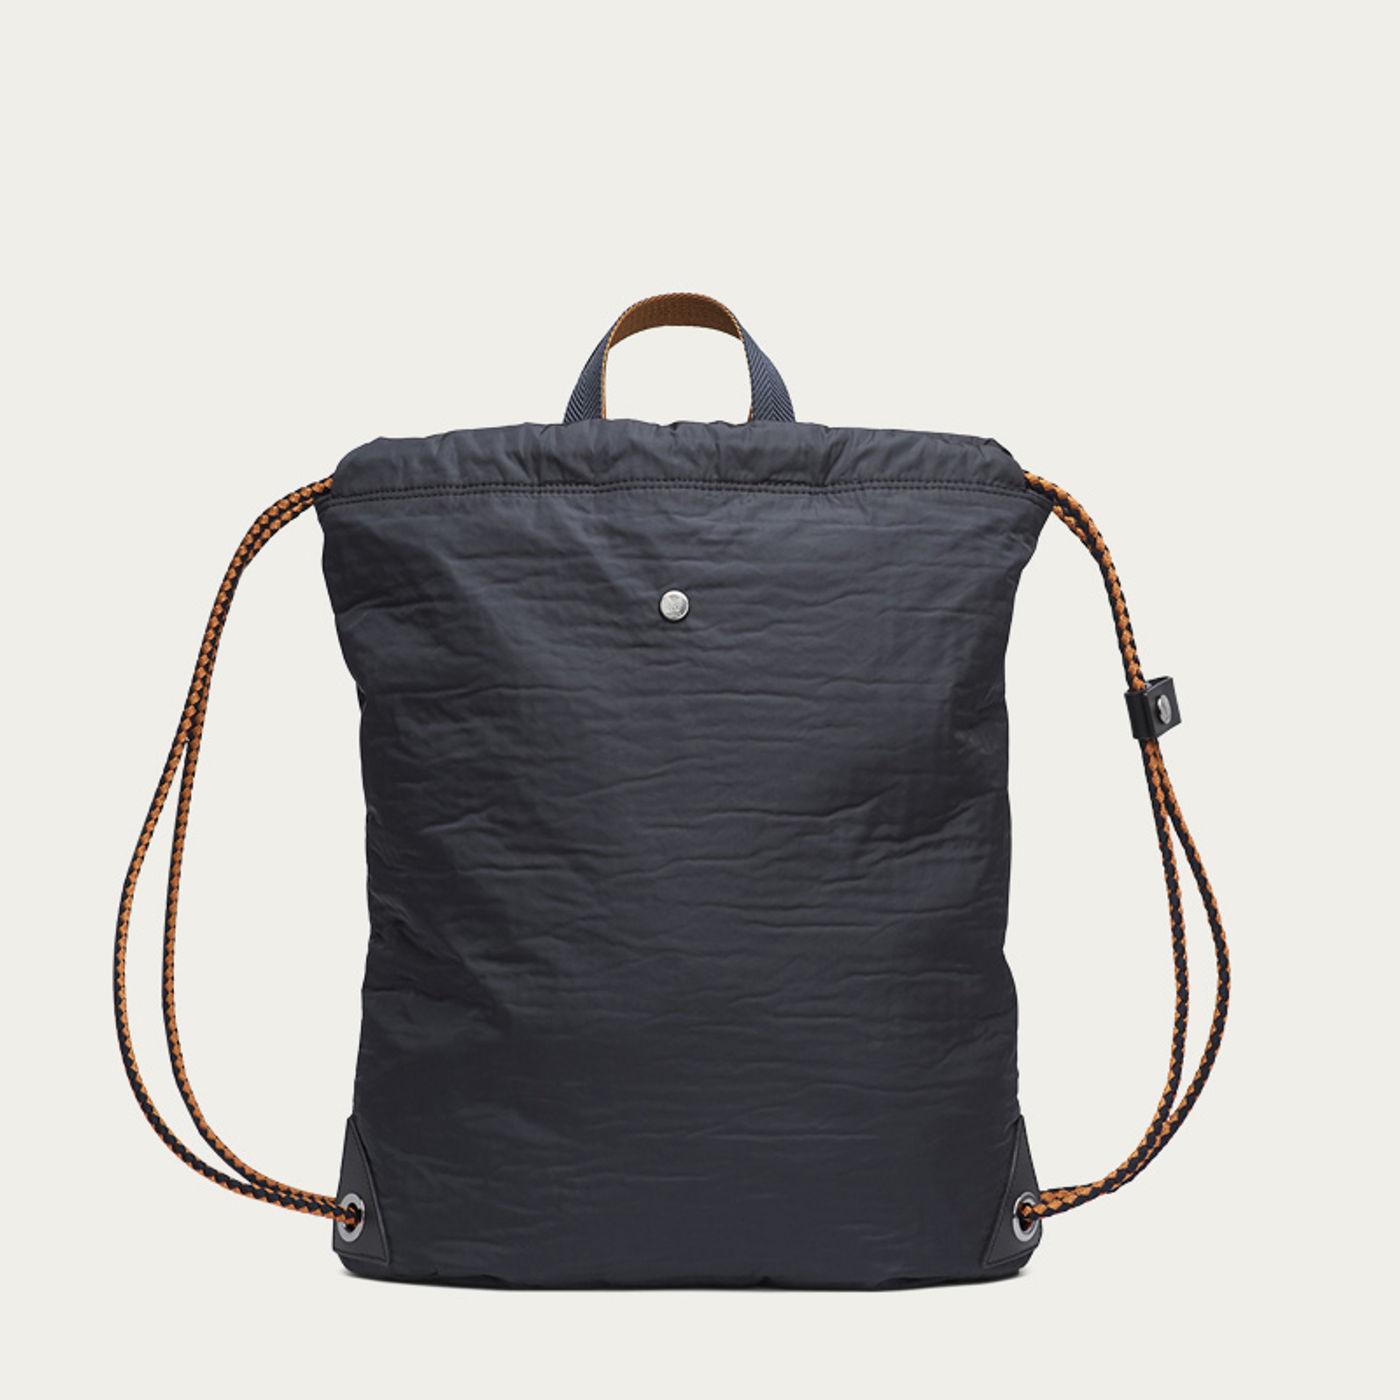 Moonlight Blue & Black/Black M/S Drawstring Backpack | Bombinate